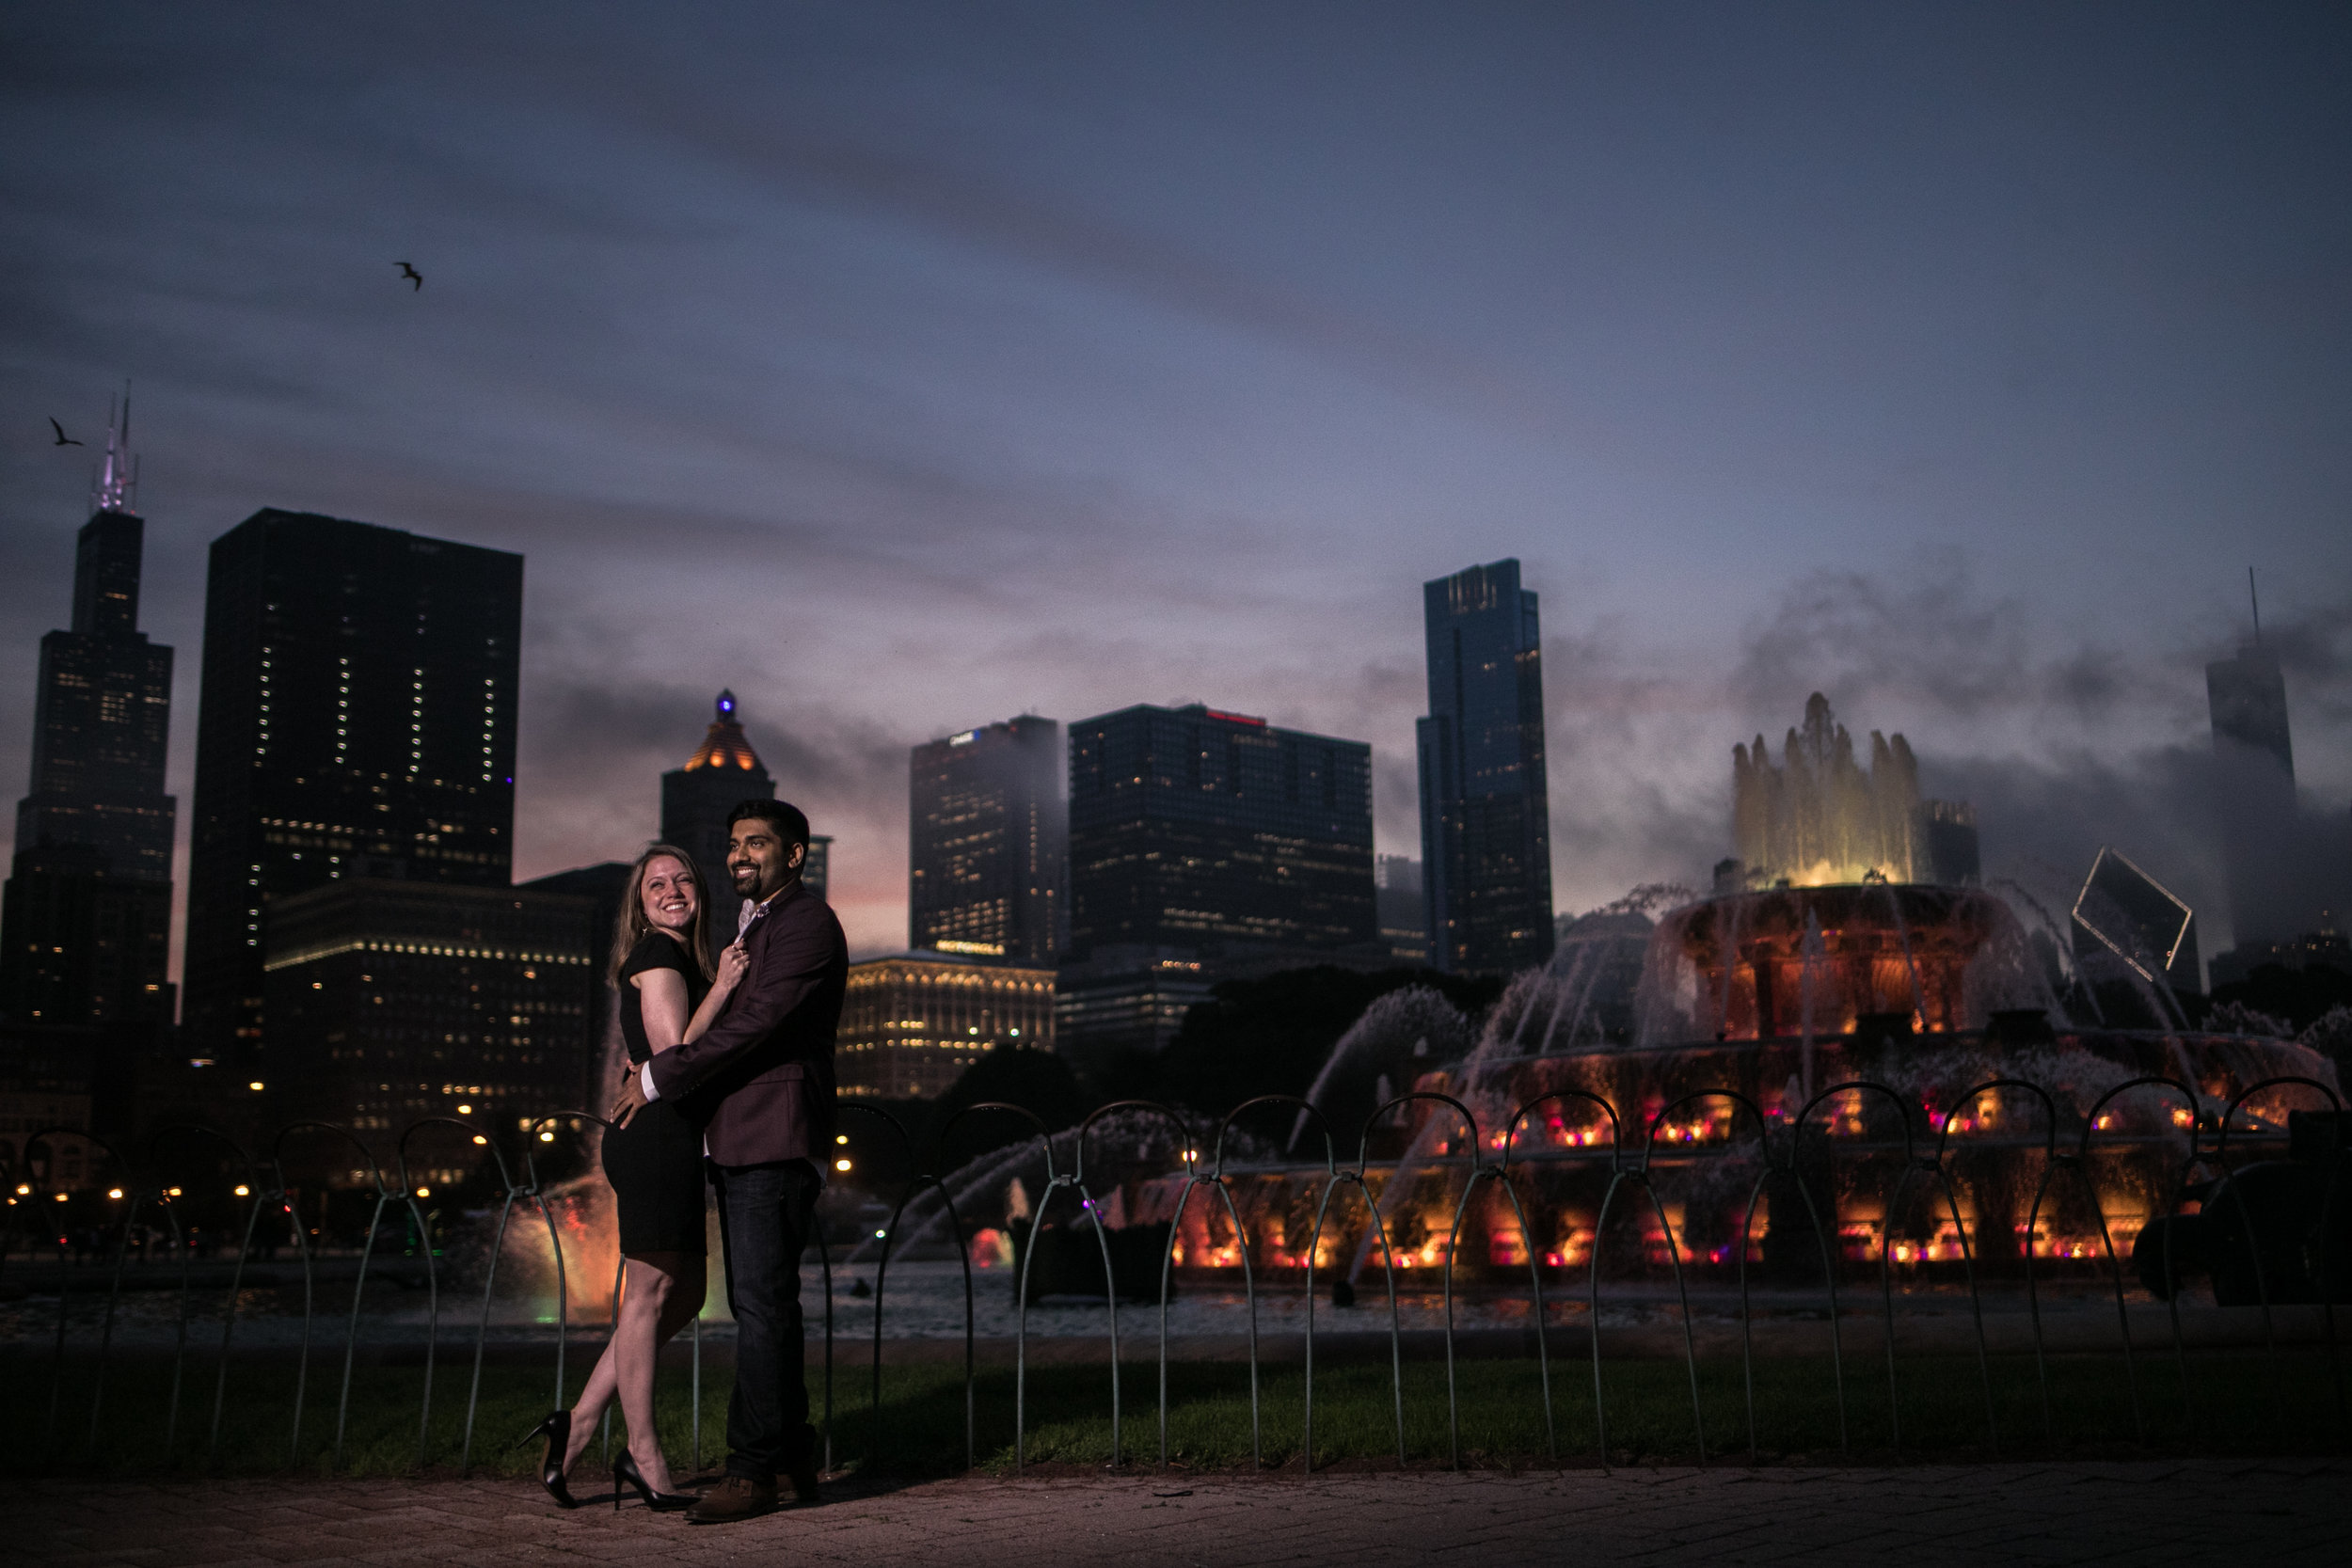 buckingham-fountain-engagement-photo-chicago-skyline-willis-tower-engaged-couple.jpg